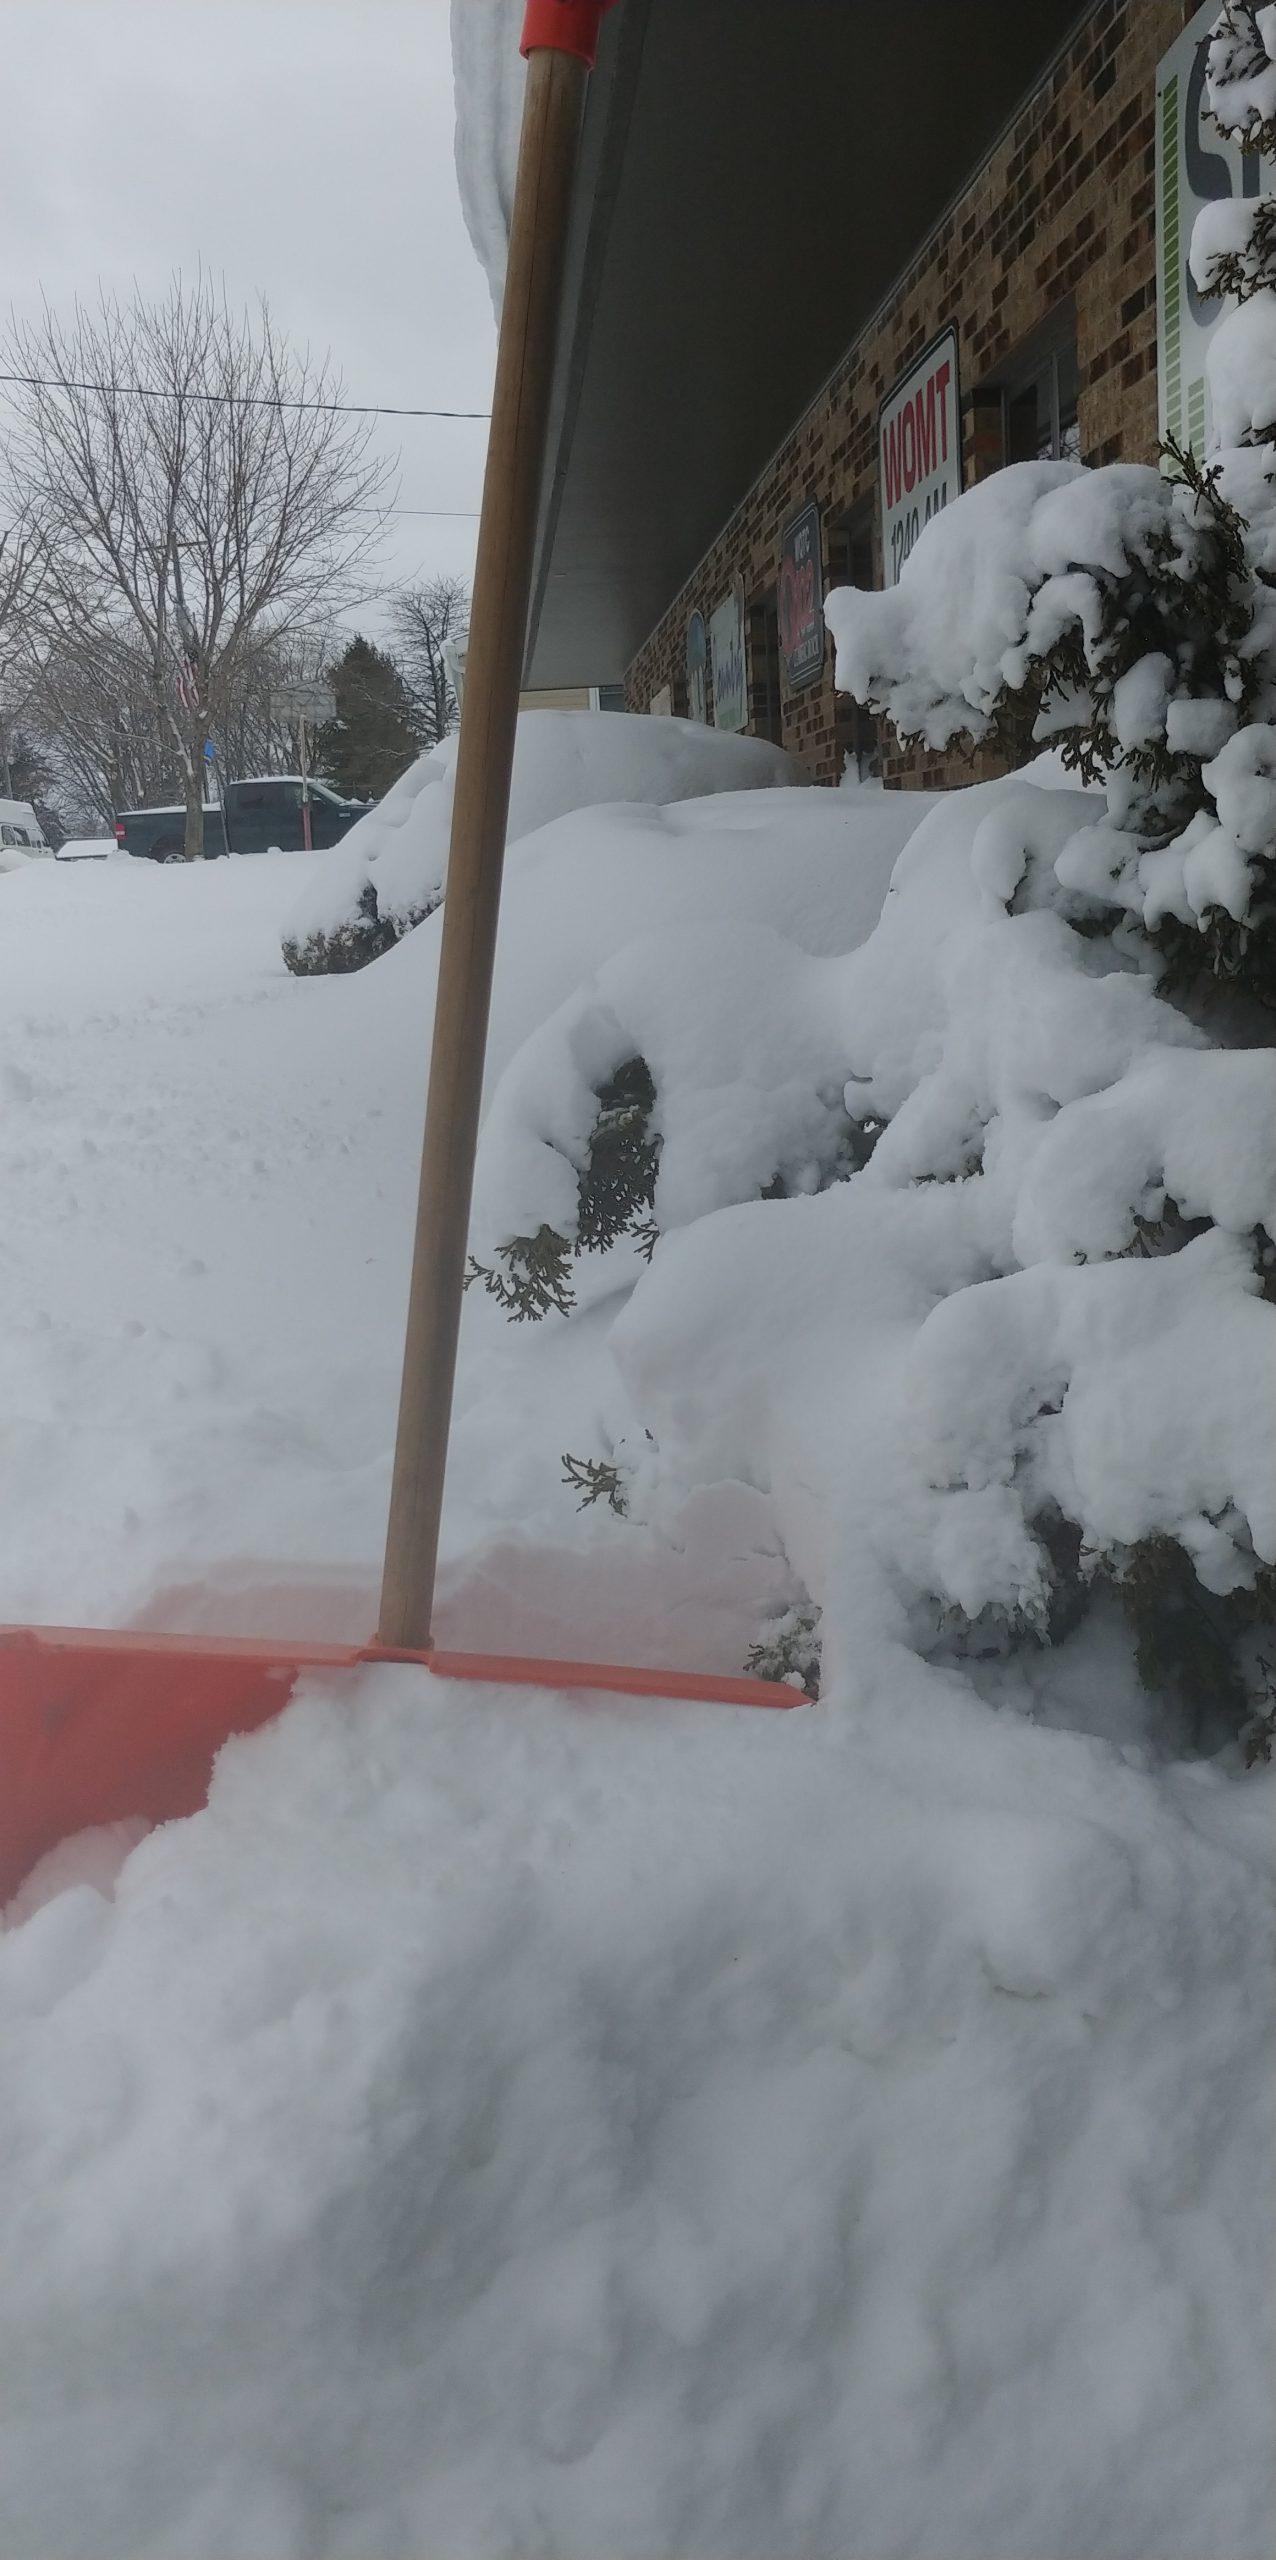 More Details Released Regarding Record Breaking Snowfall